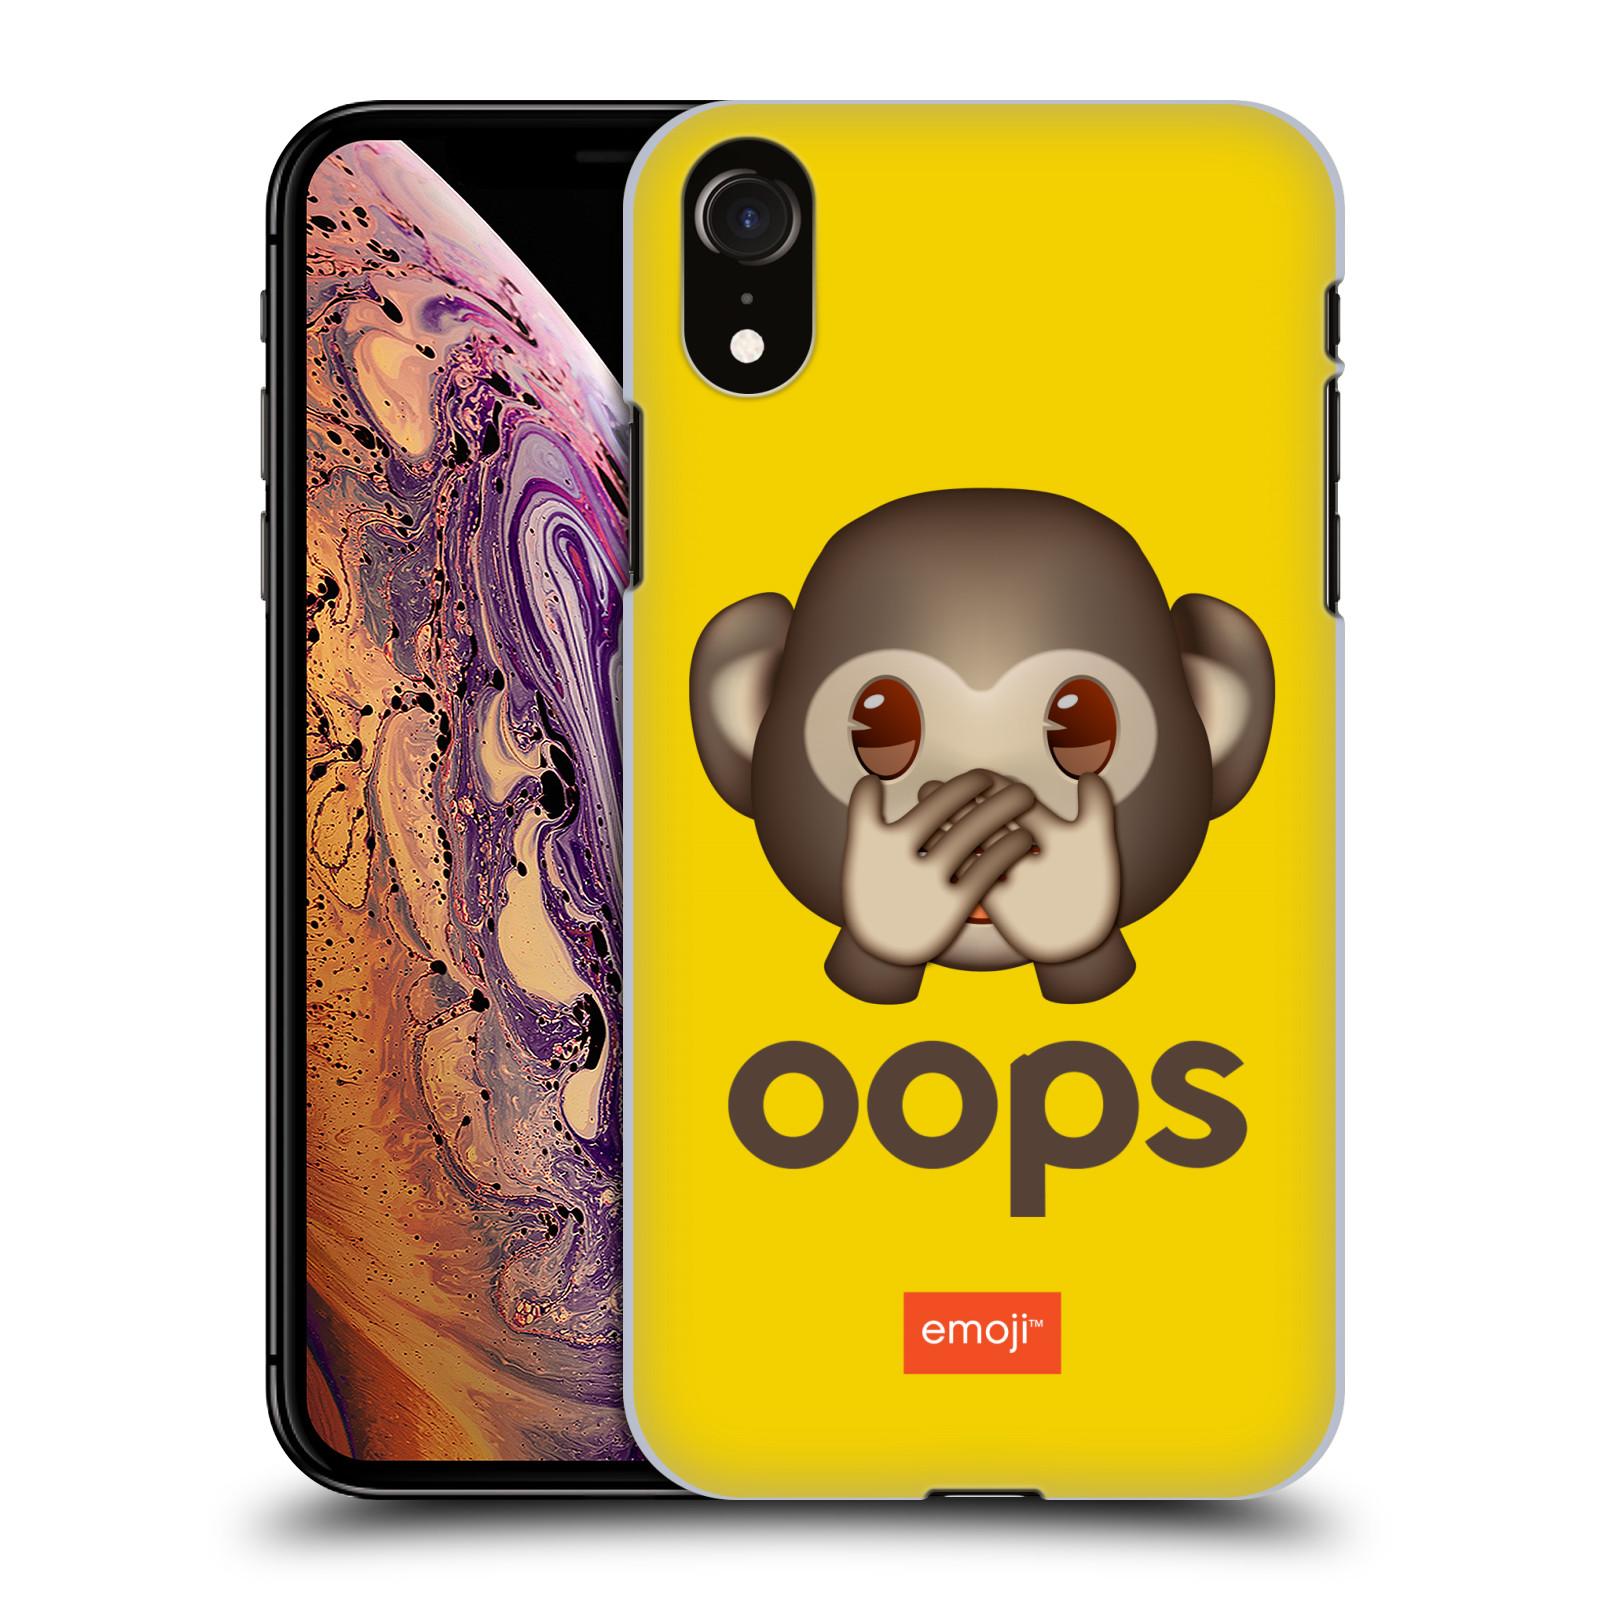 Plastové pouzdro na mobil Apple iPhone XR - Head Case - EMOJI - Opička OOPS